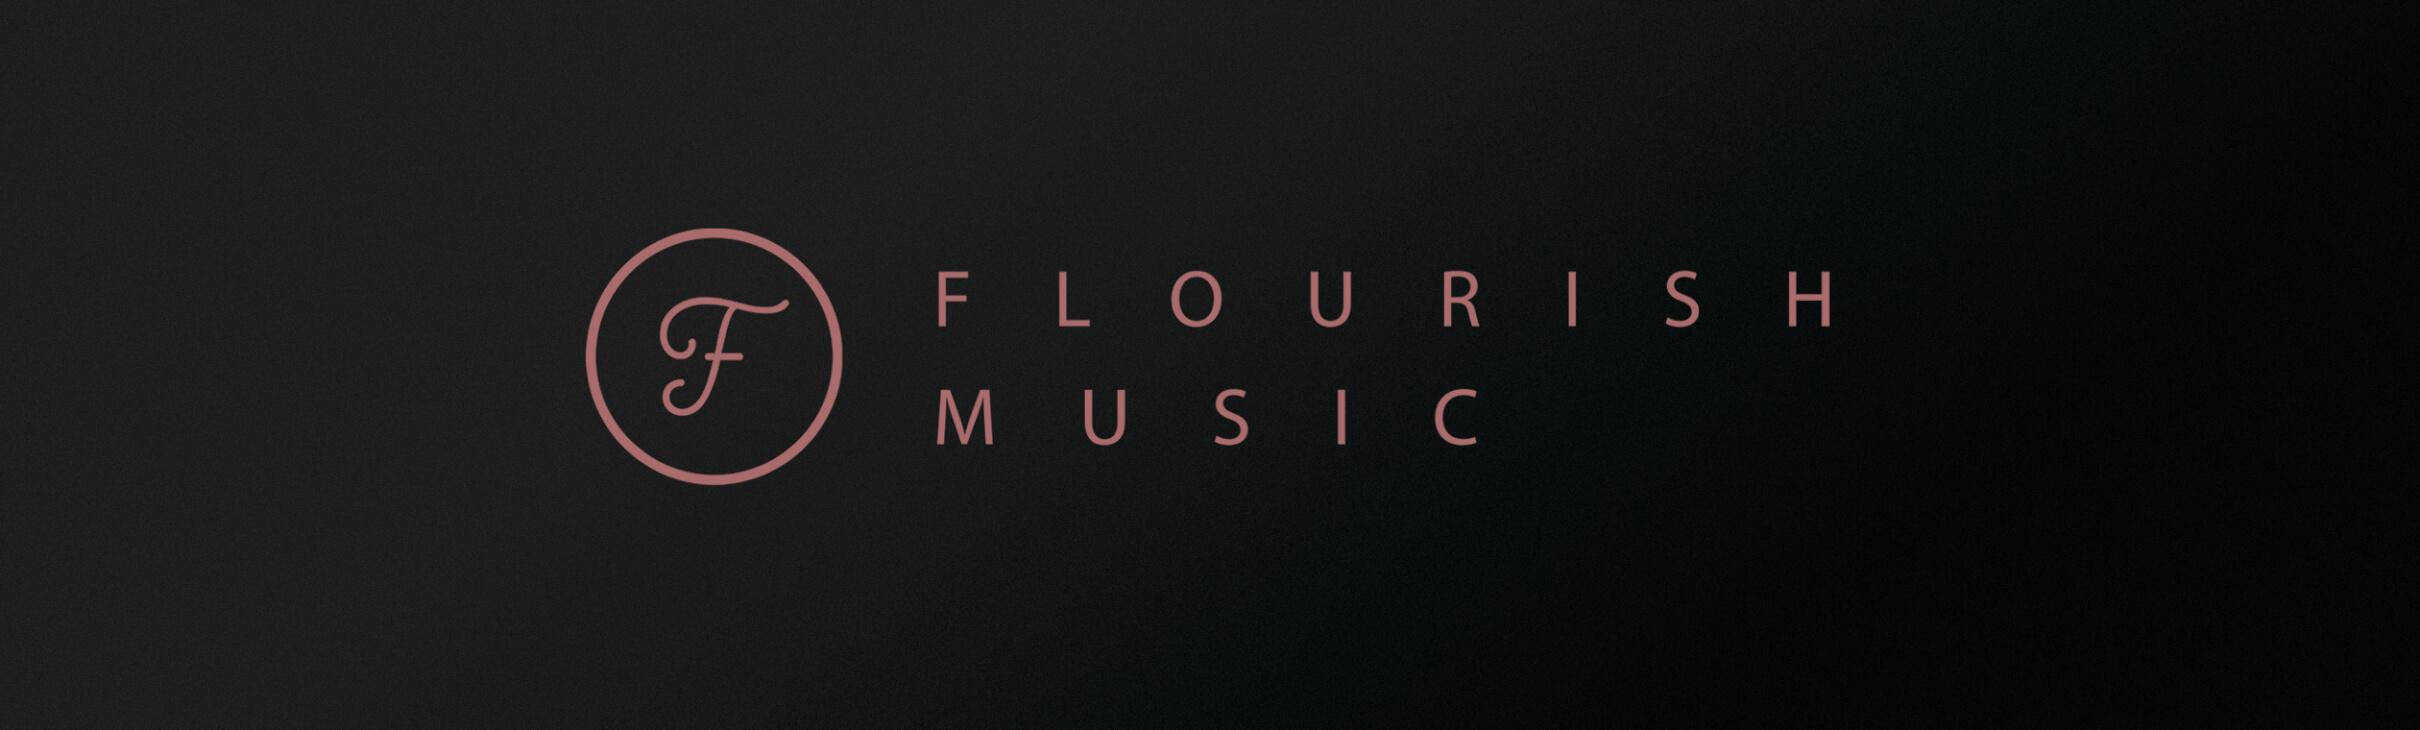 Flourish Music